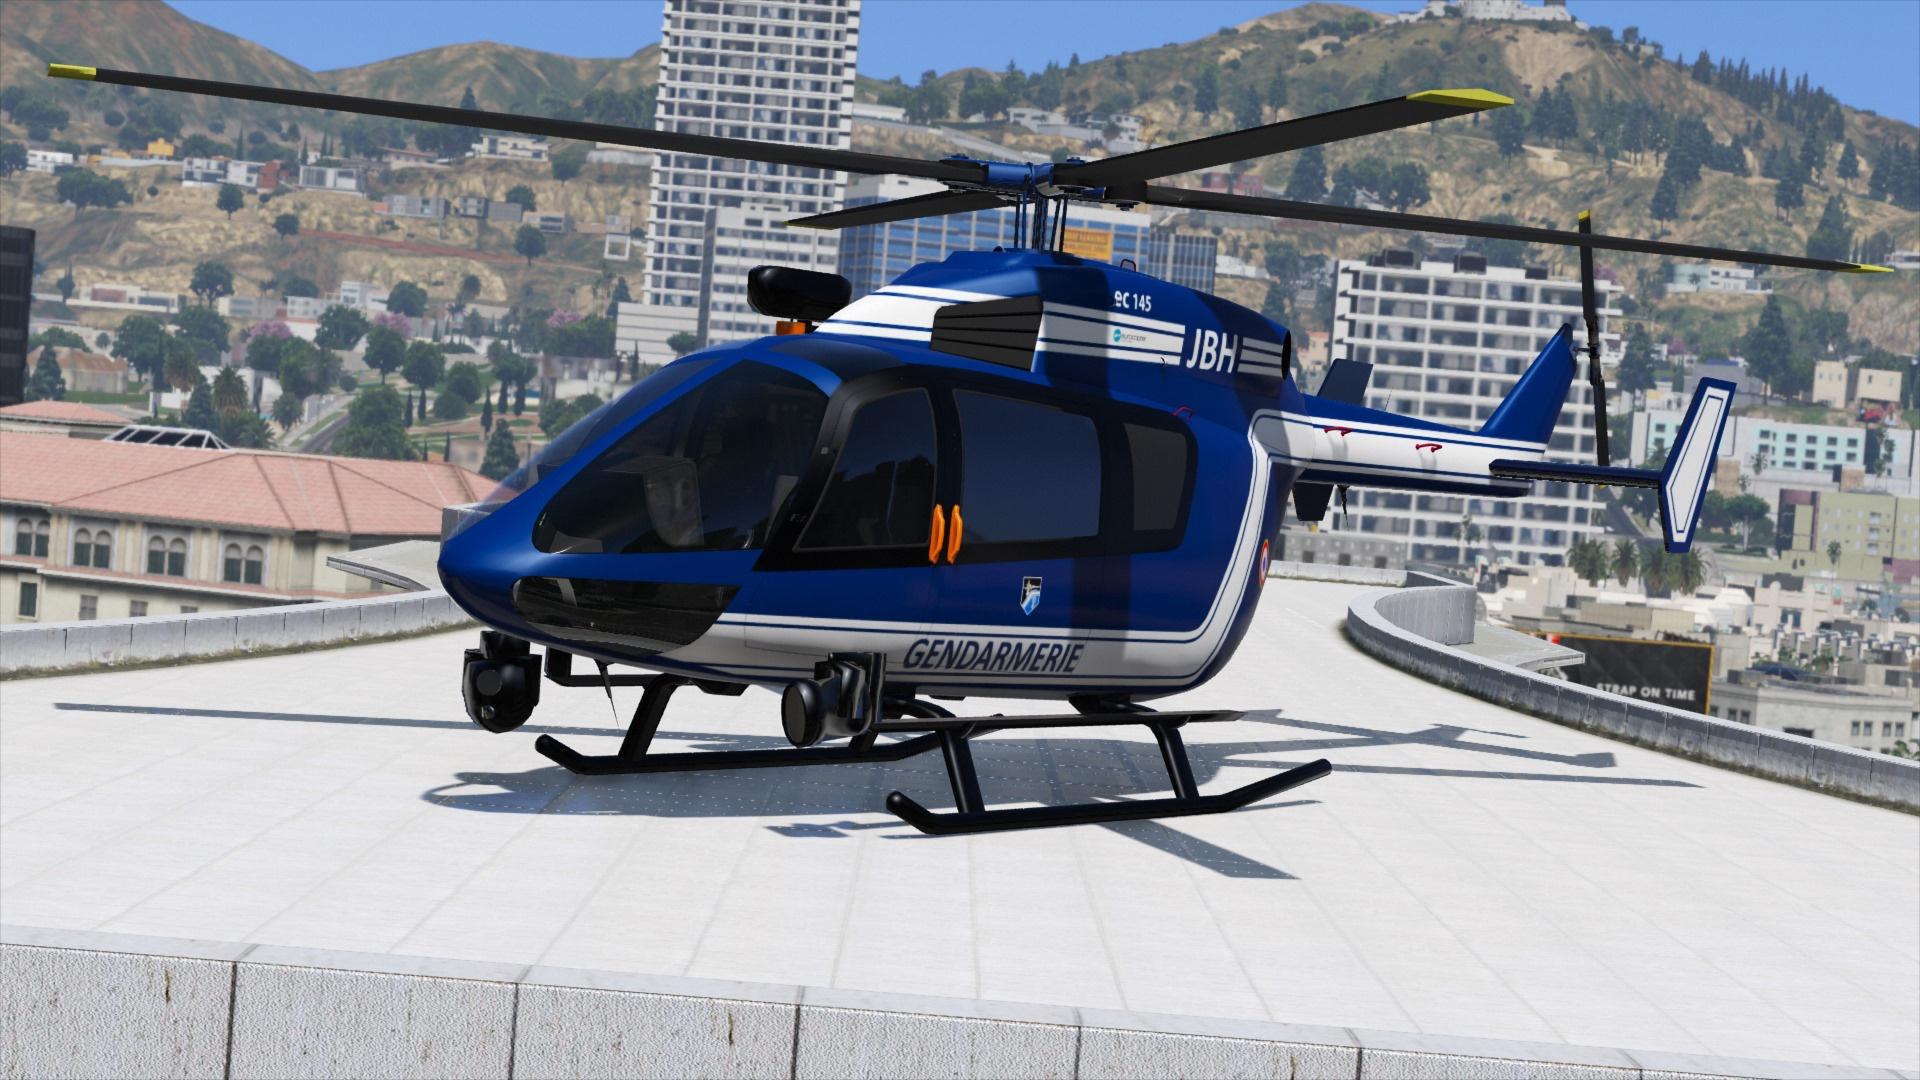 eurocopter ec145 gendarmerie template gta5 mods com